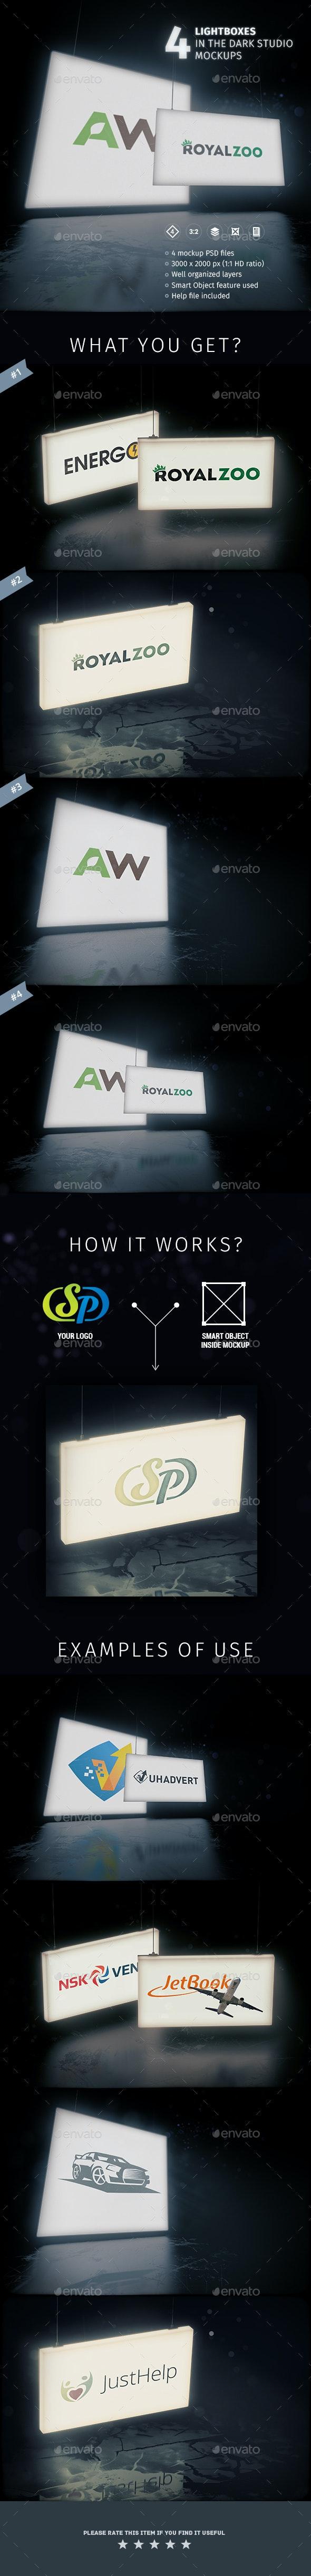 4 Lightboxes In The Dark Studio Mockups - Logo Product Mock-Ups